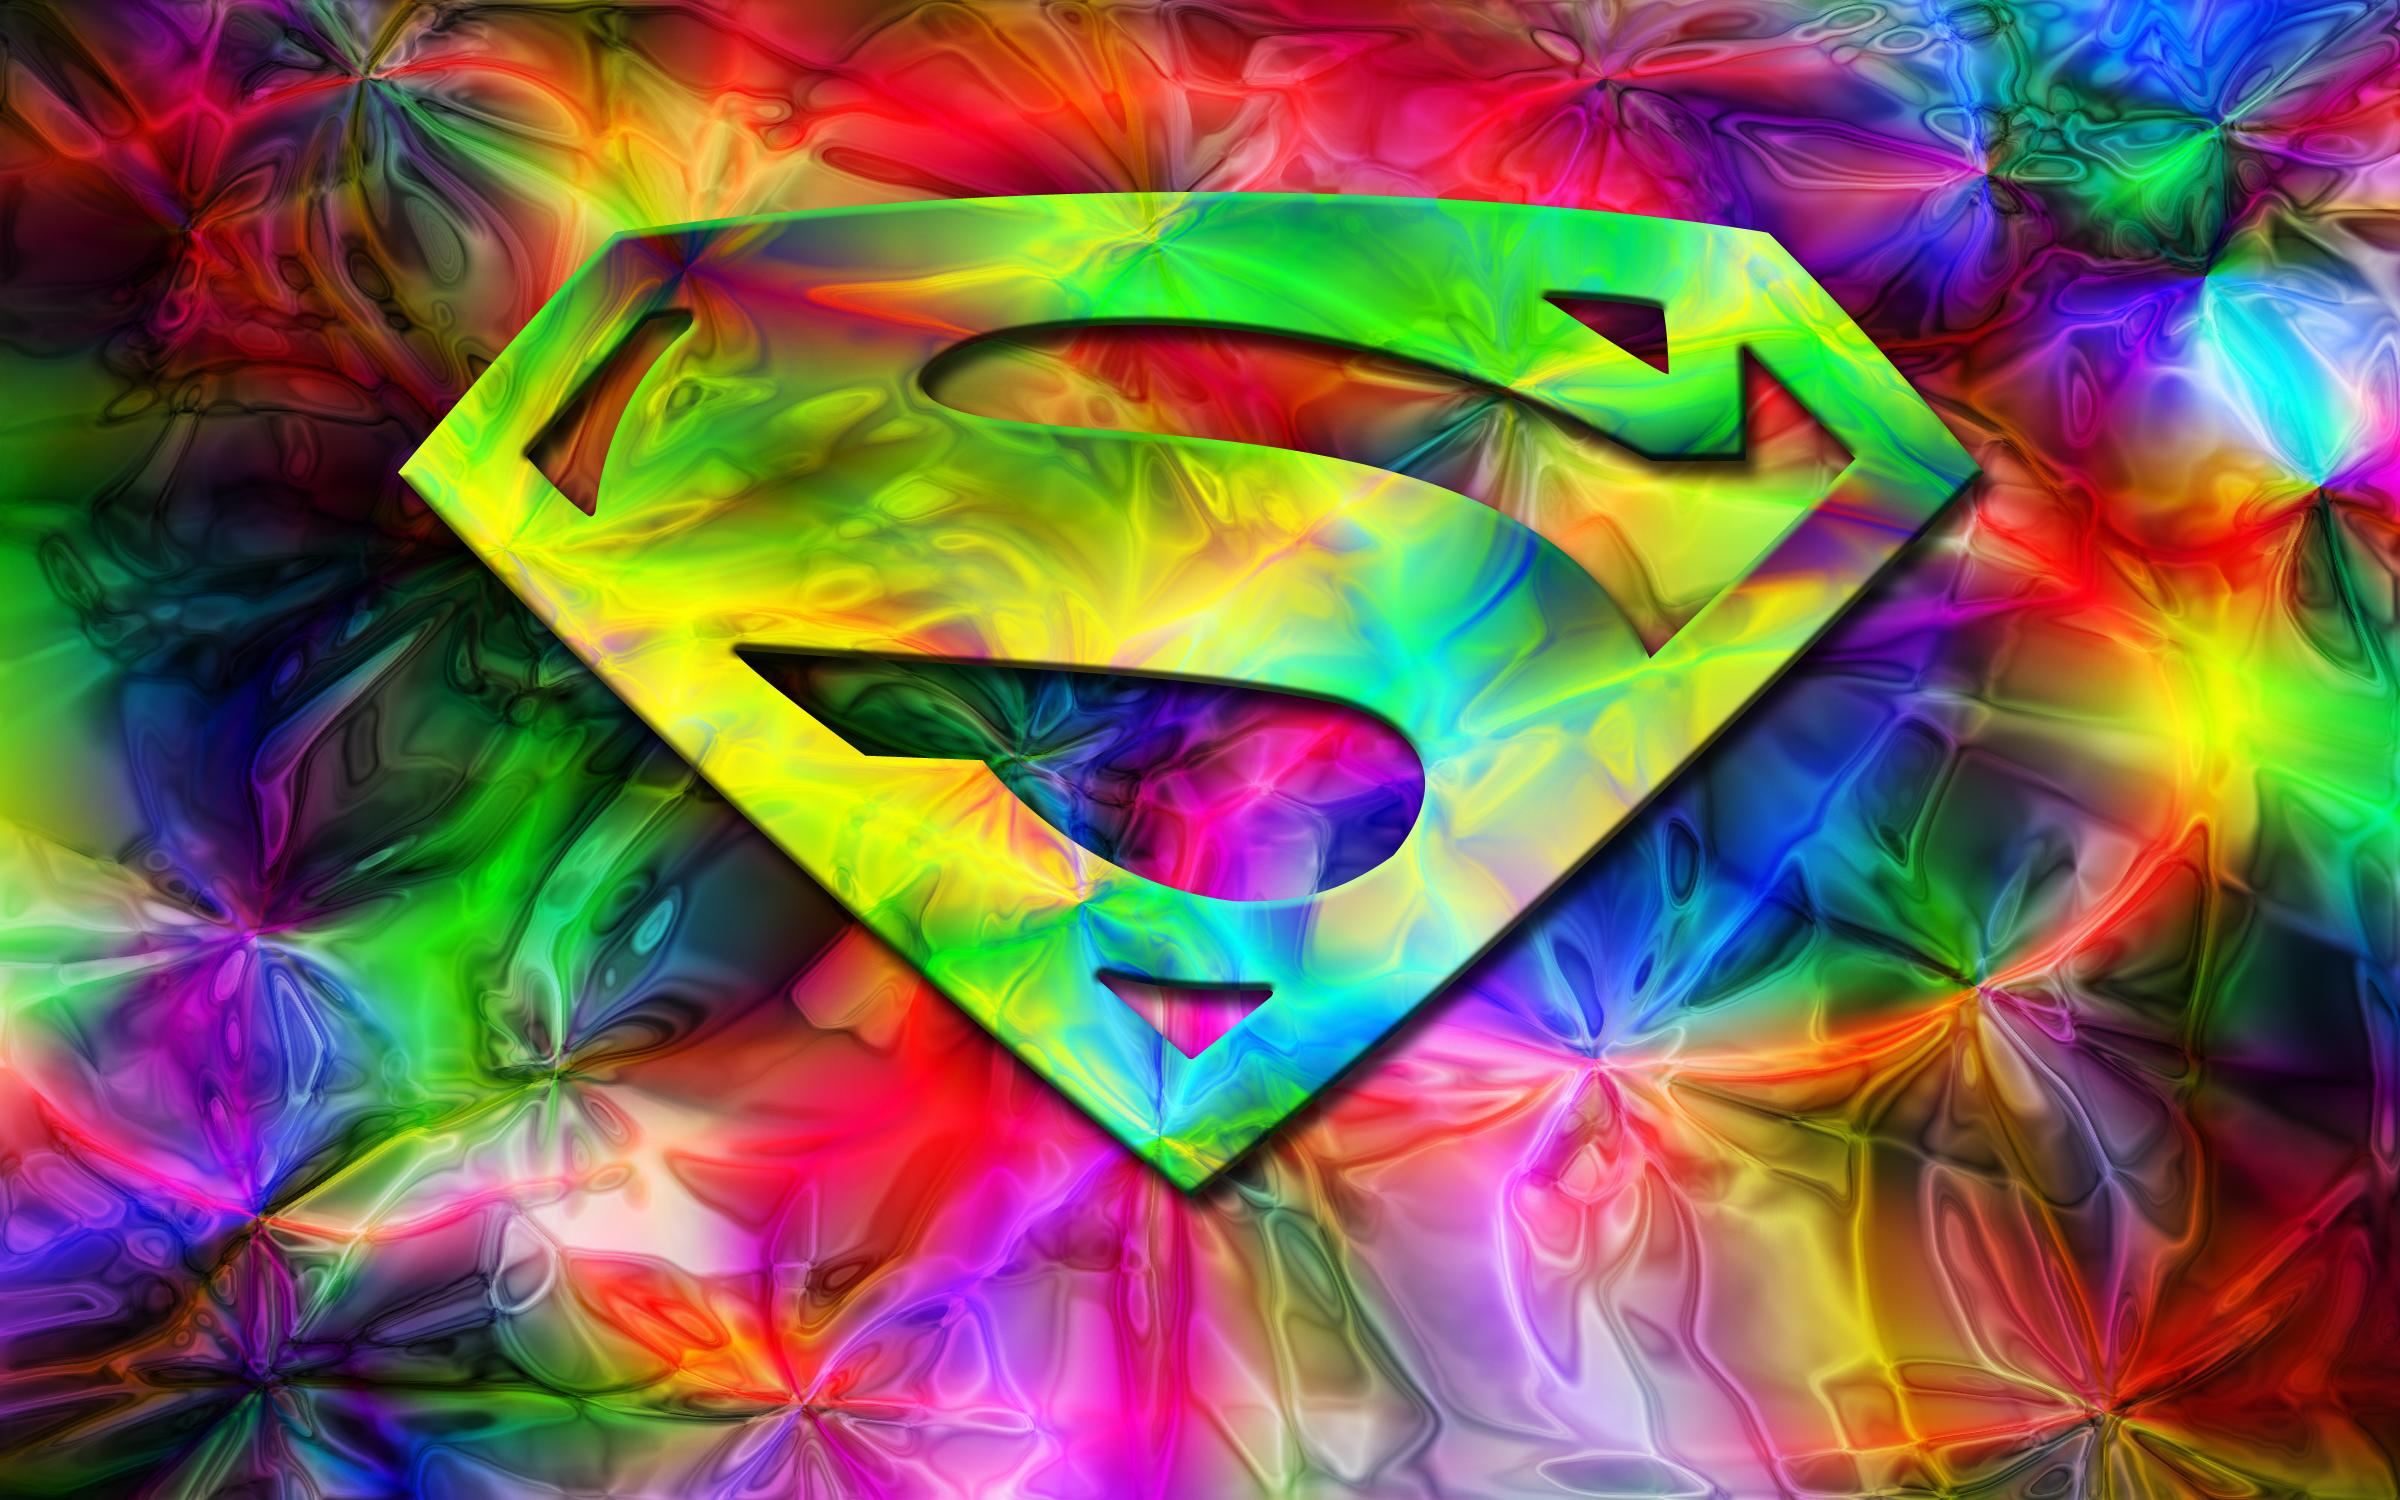 Superman in Color Widescreen by the big al 2400x1500